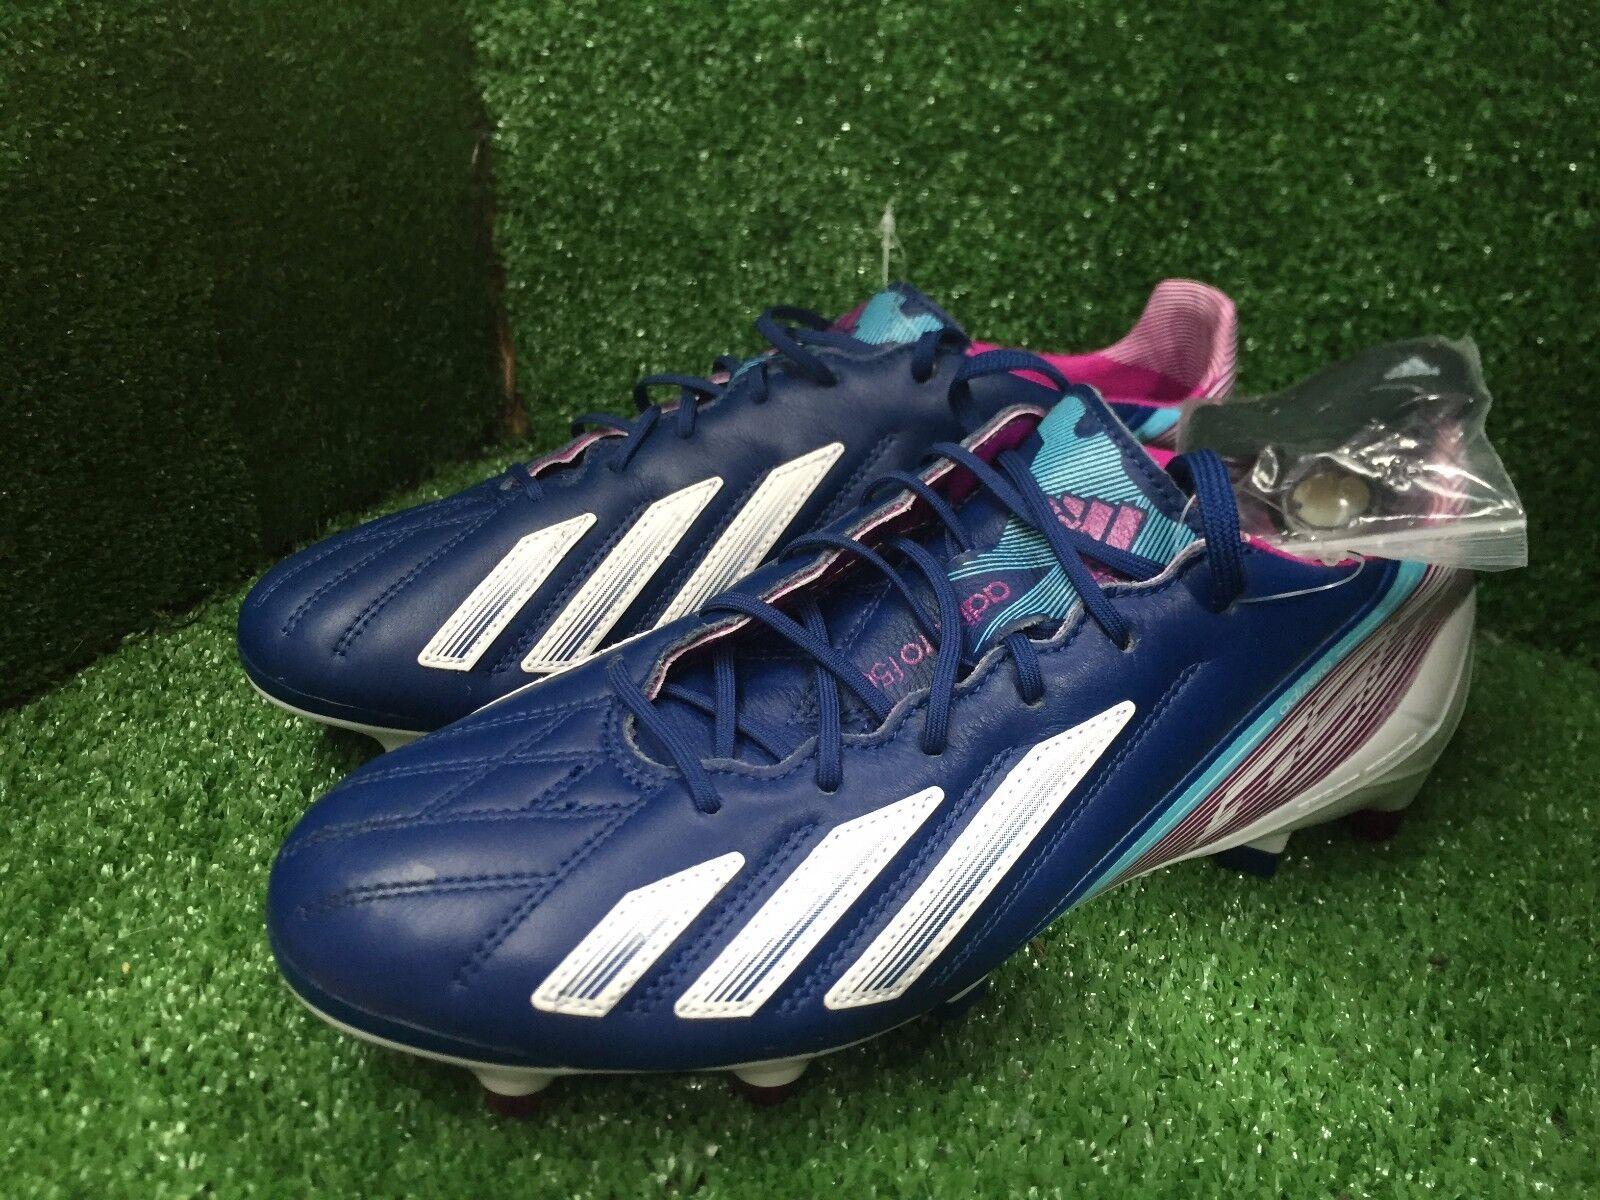 Adidas f50 Adizero Sg Zapatos púrpura F50+ 8 7,5 41